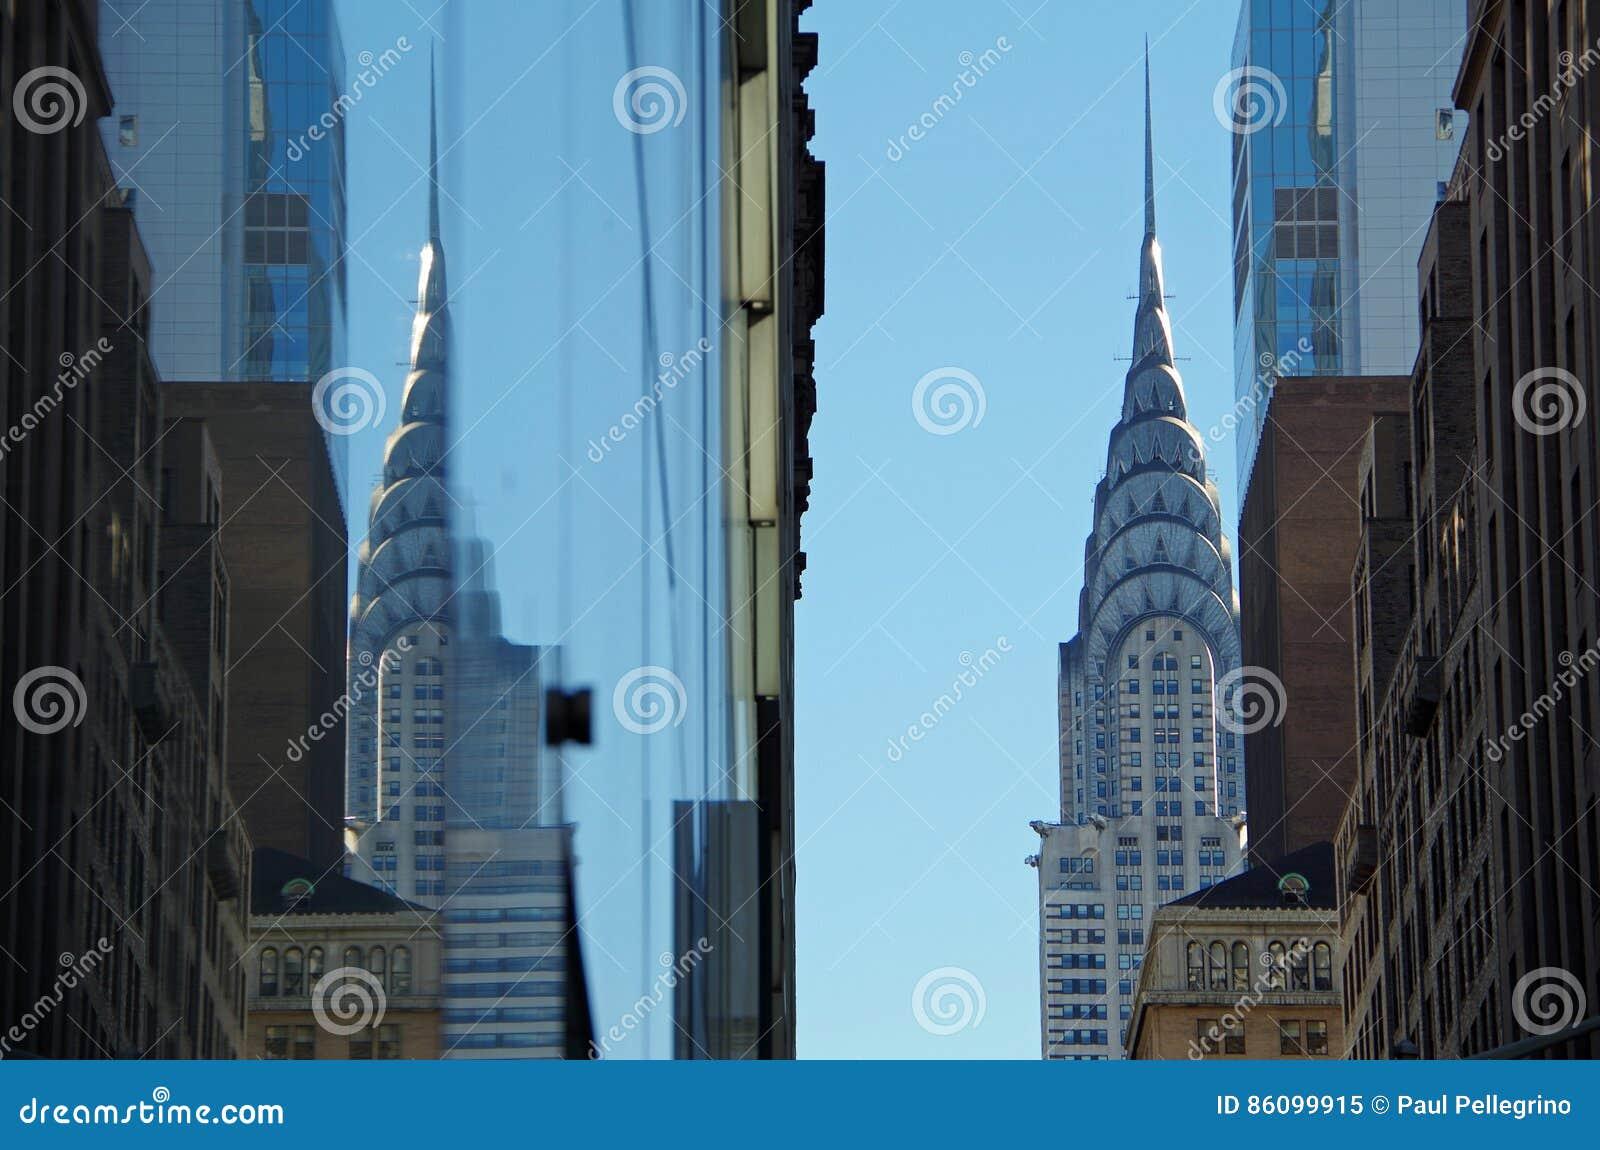 New York New York February Fourth The Chrysler Building